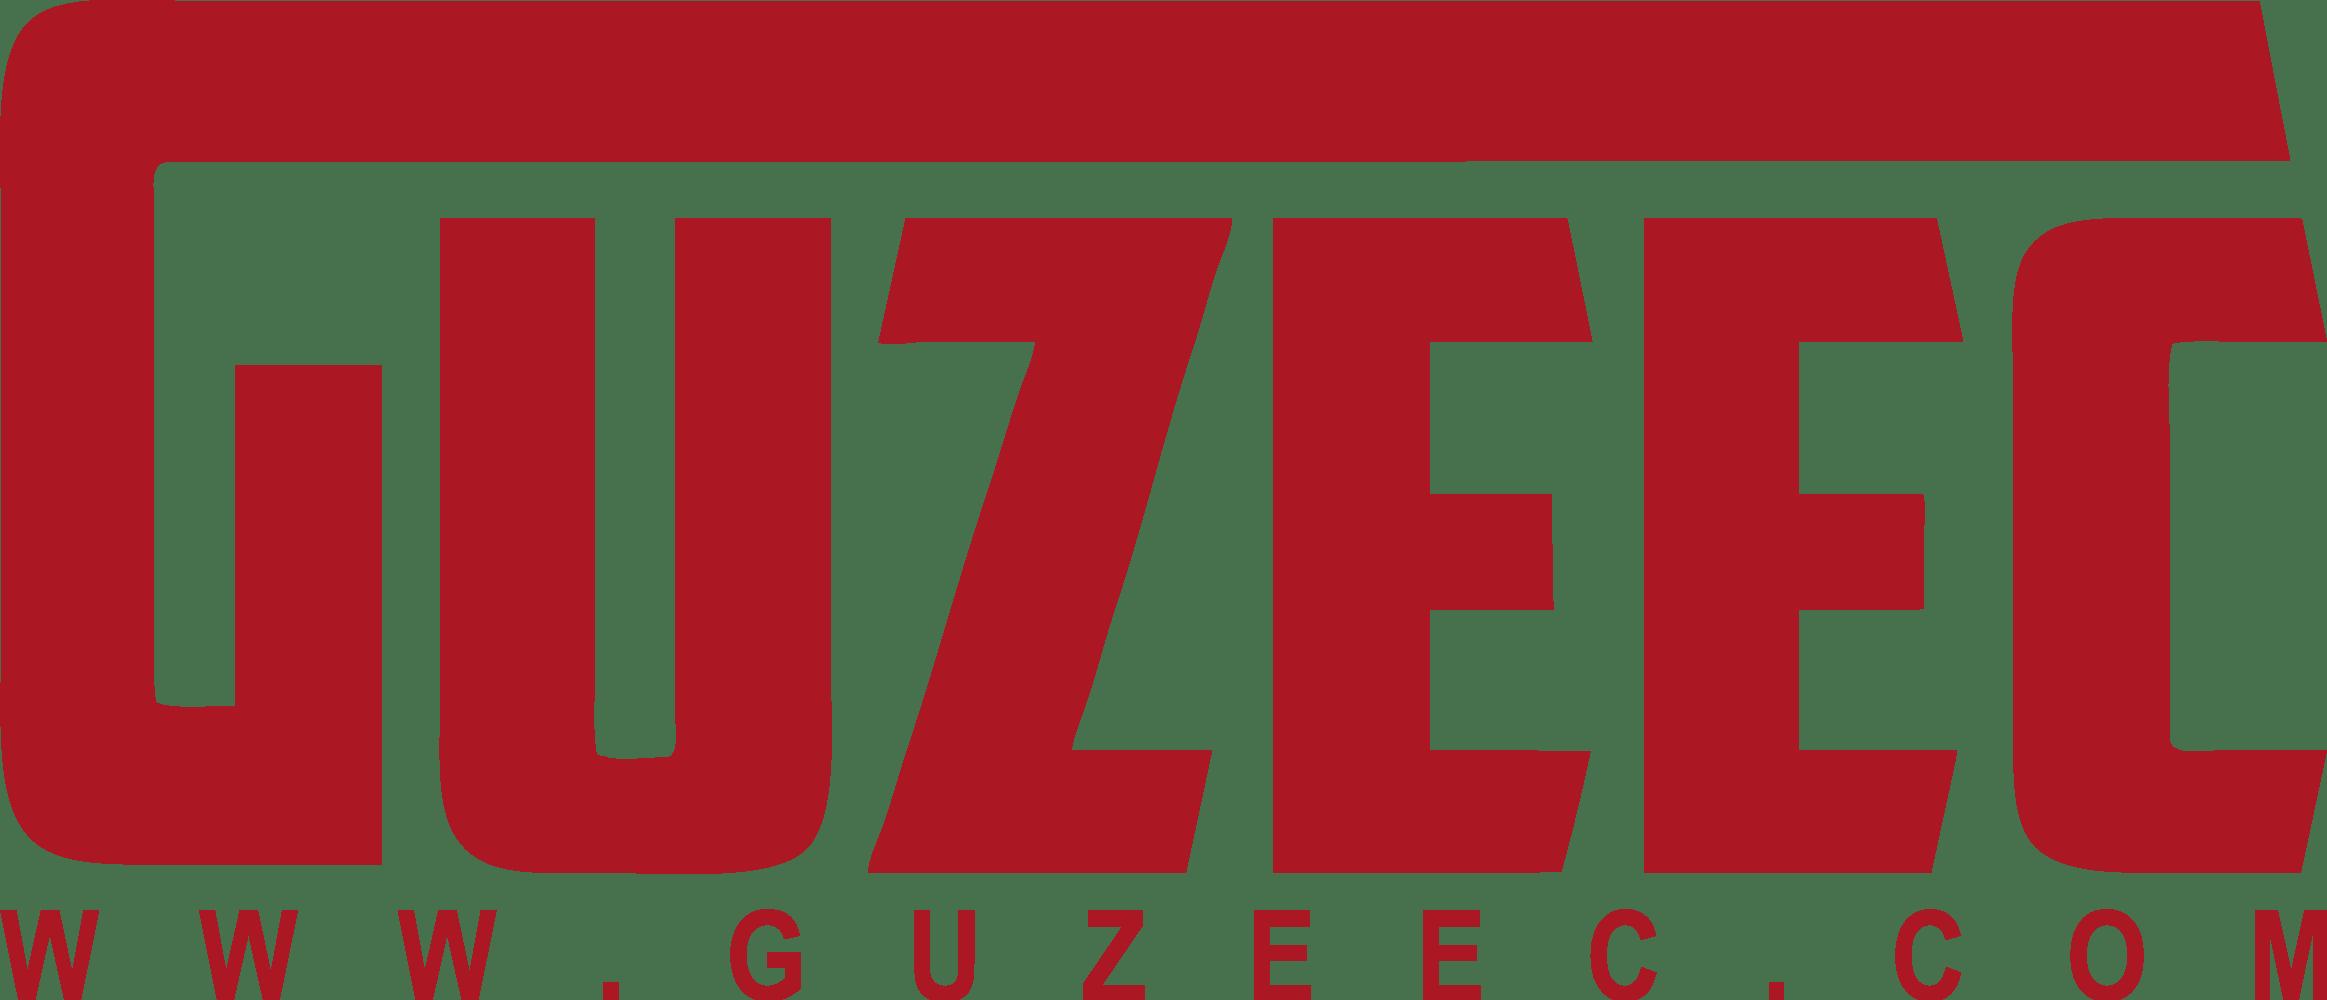 Guzeec